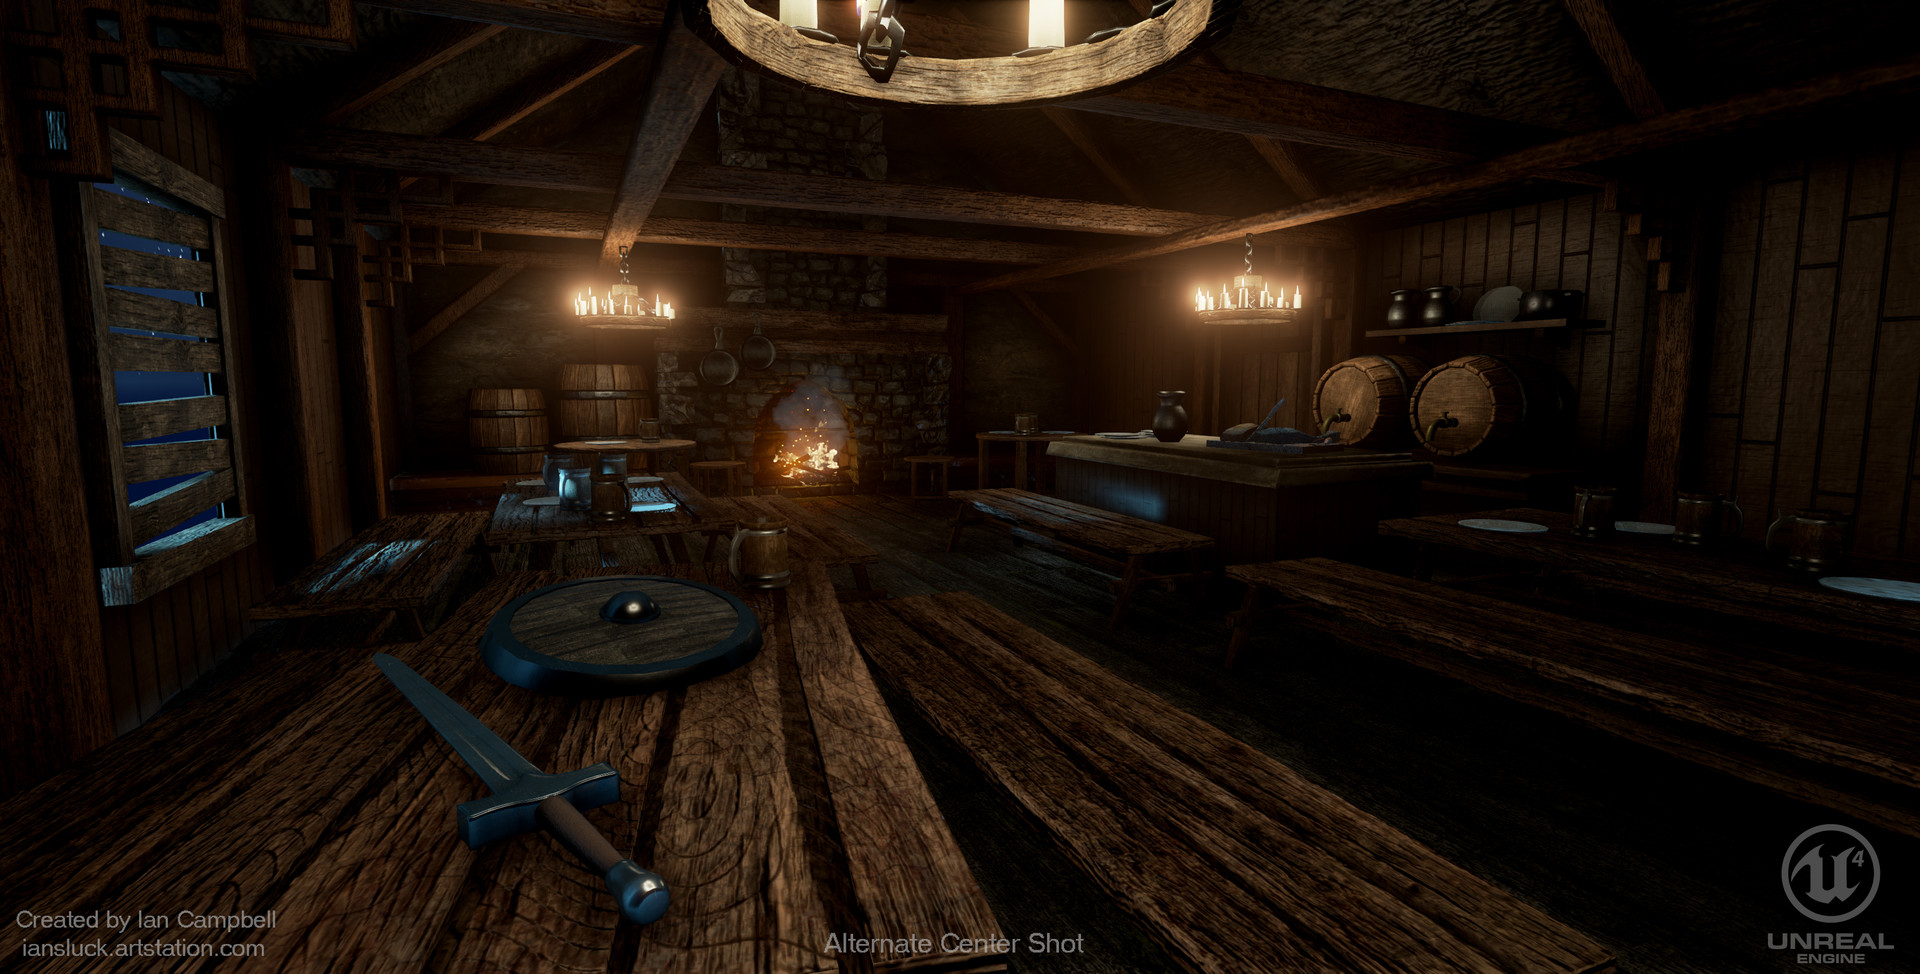 Ian Campbell Fantasy Tavern Ue4 Environment Scene